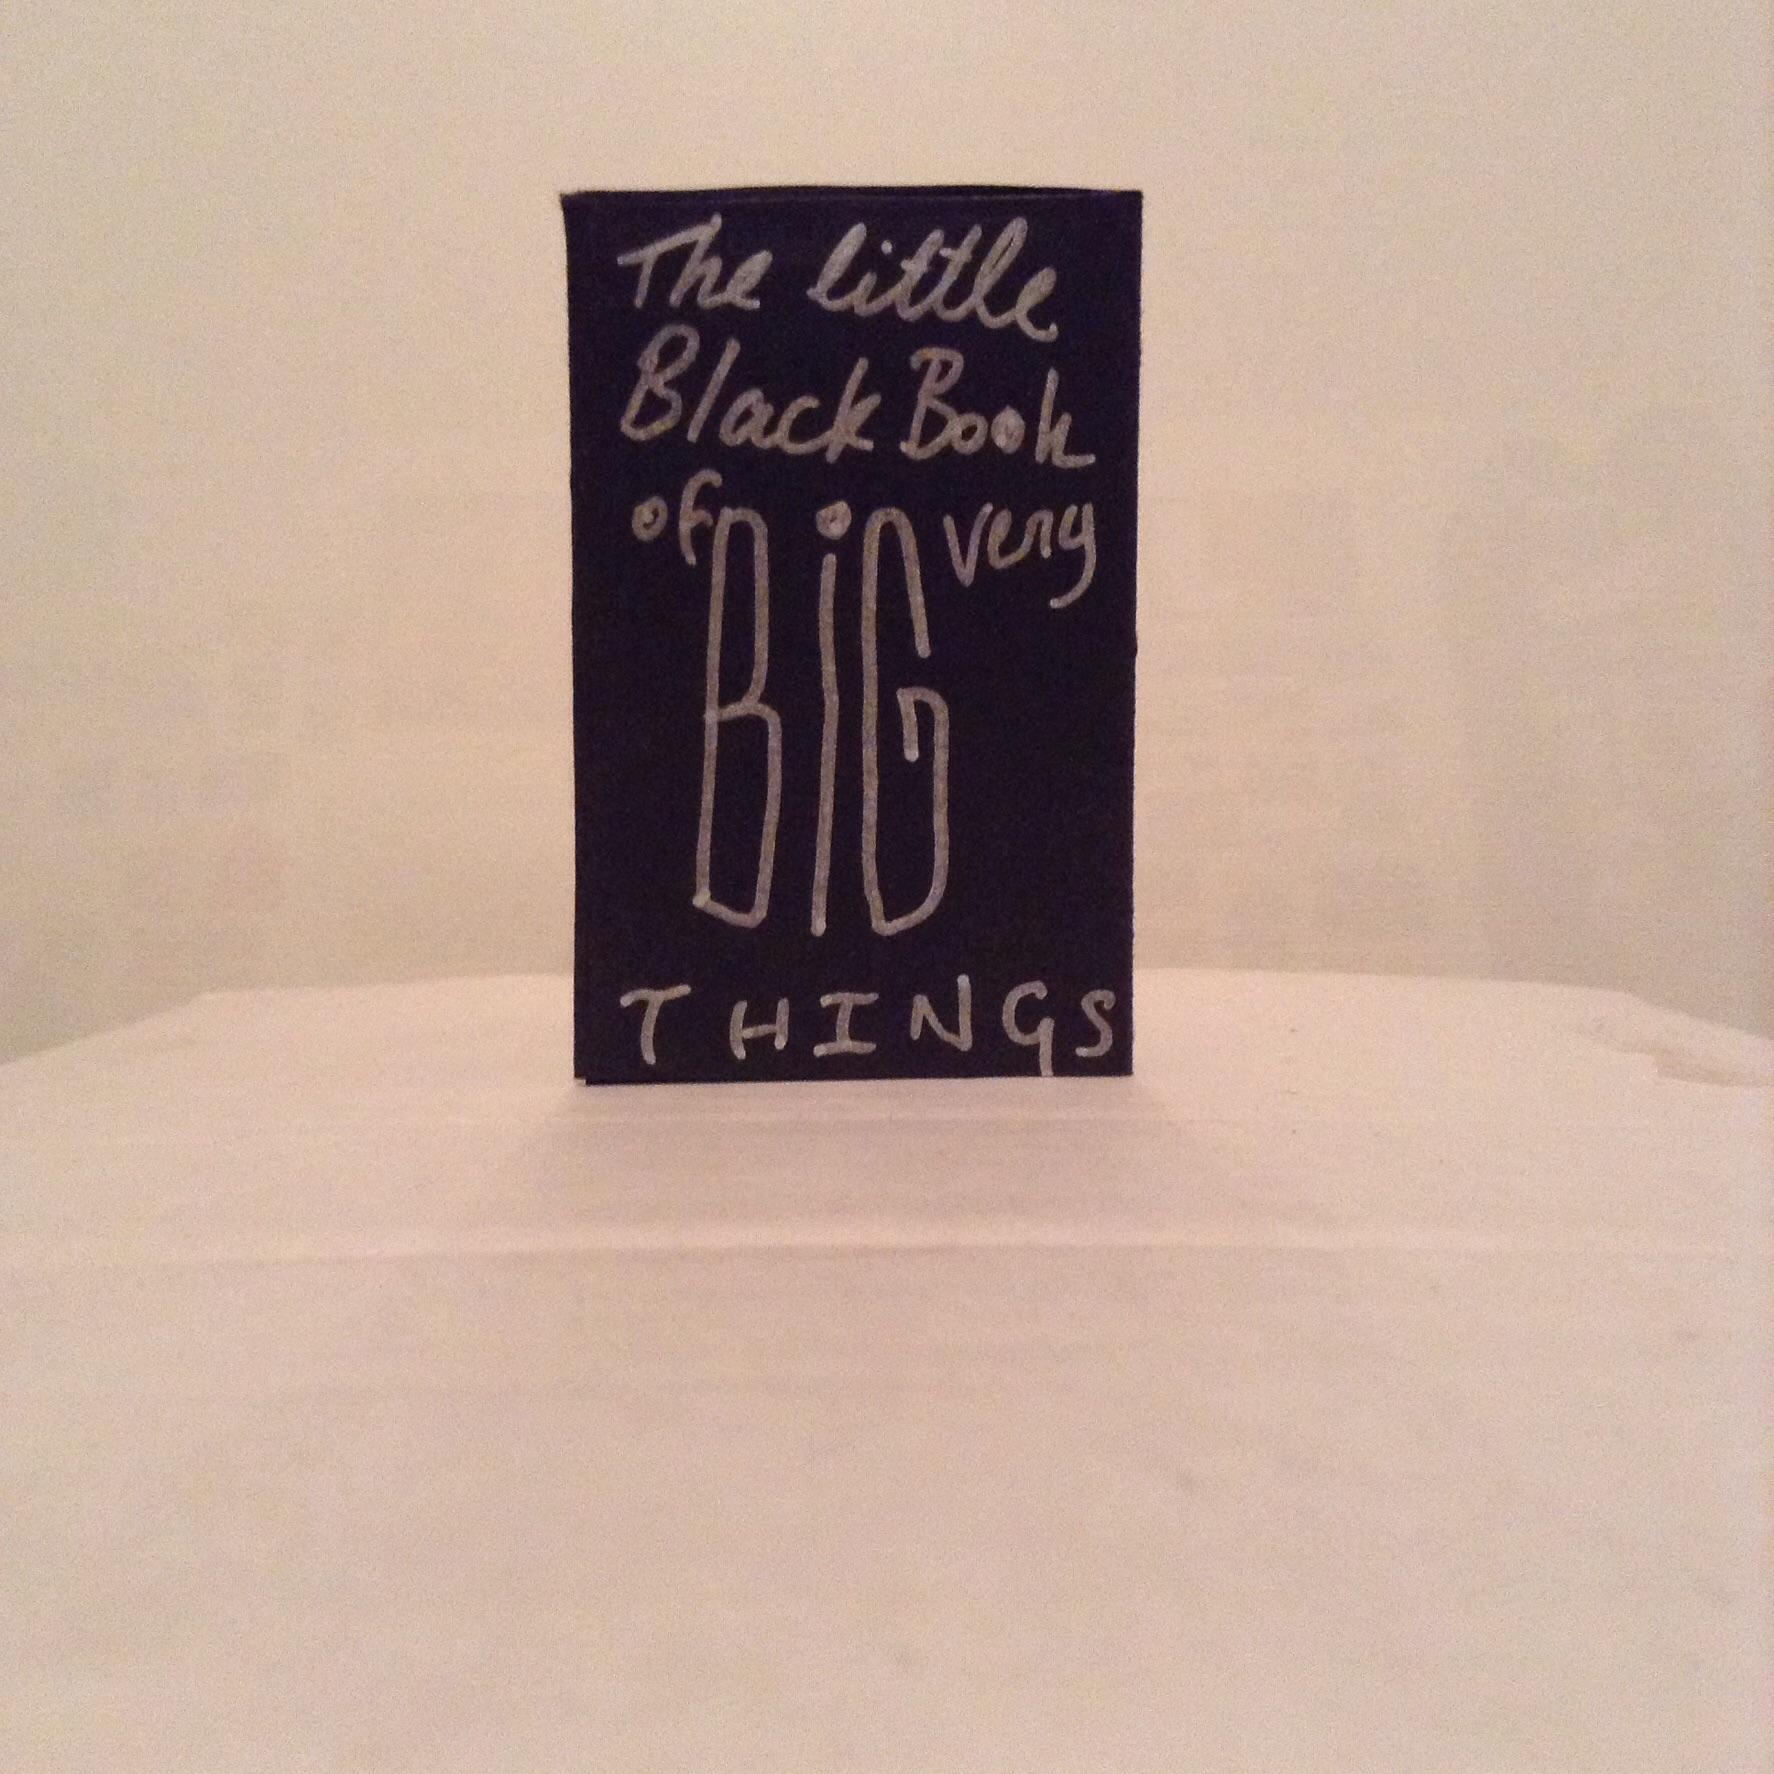 Little black book online shopping